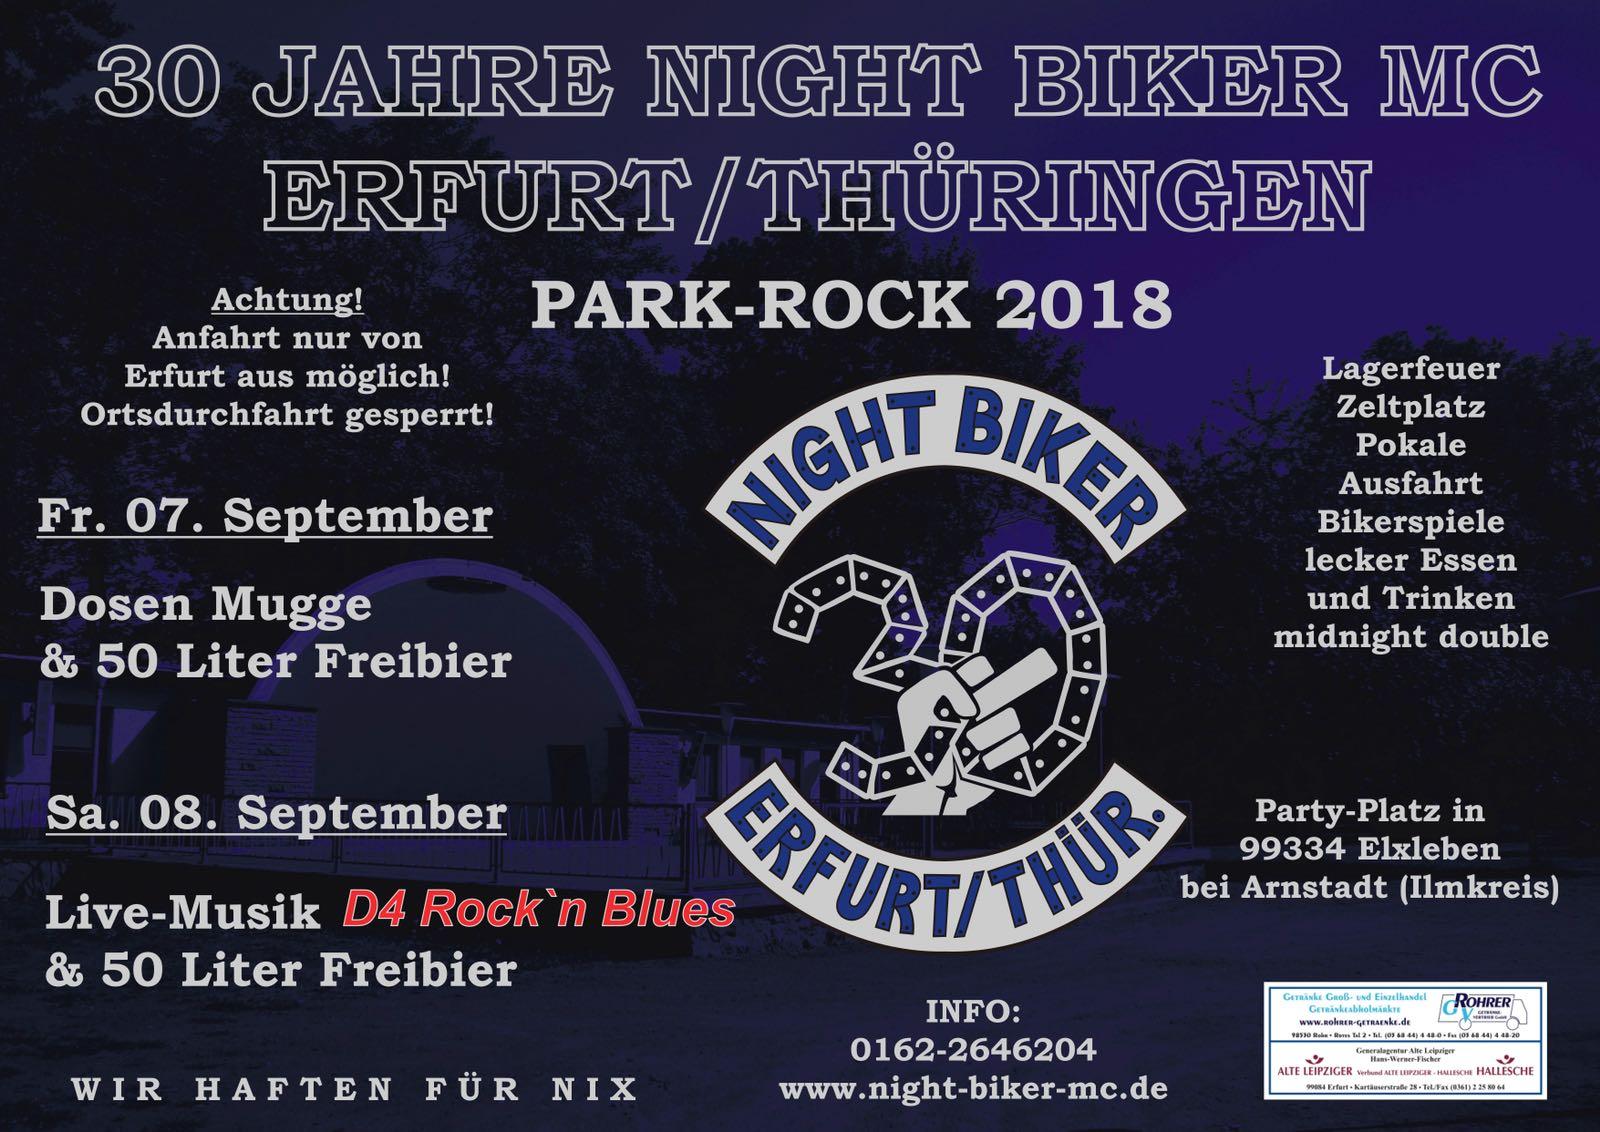 Night Biker MC | Erfurt